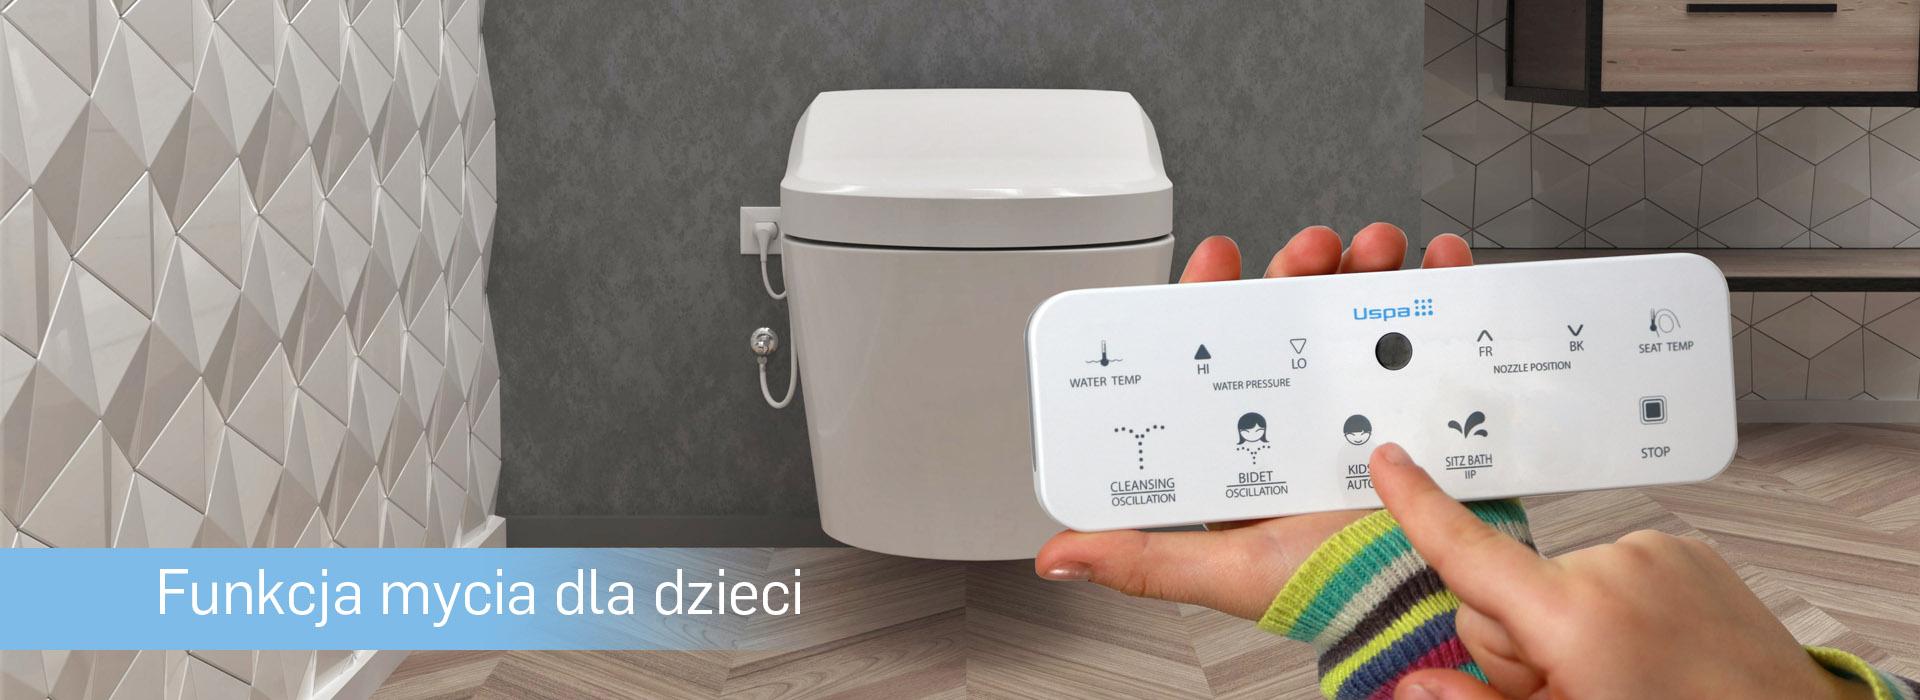 WC z bidetem